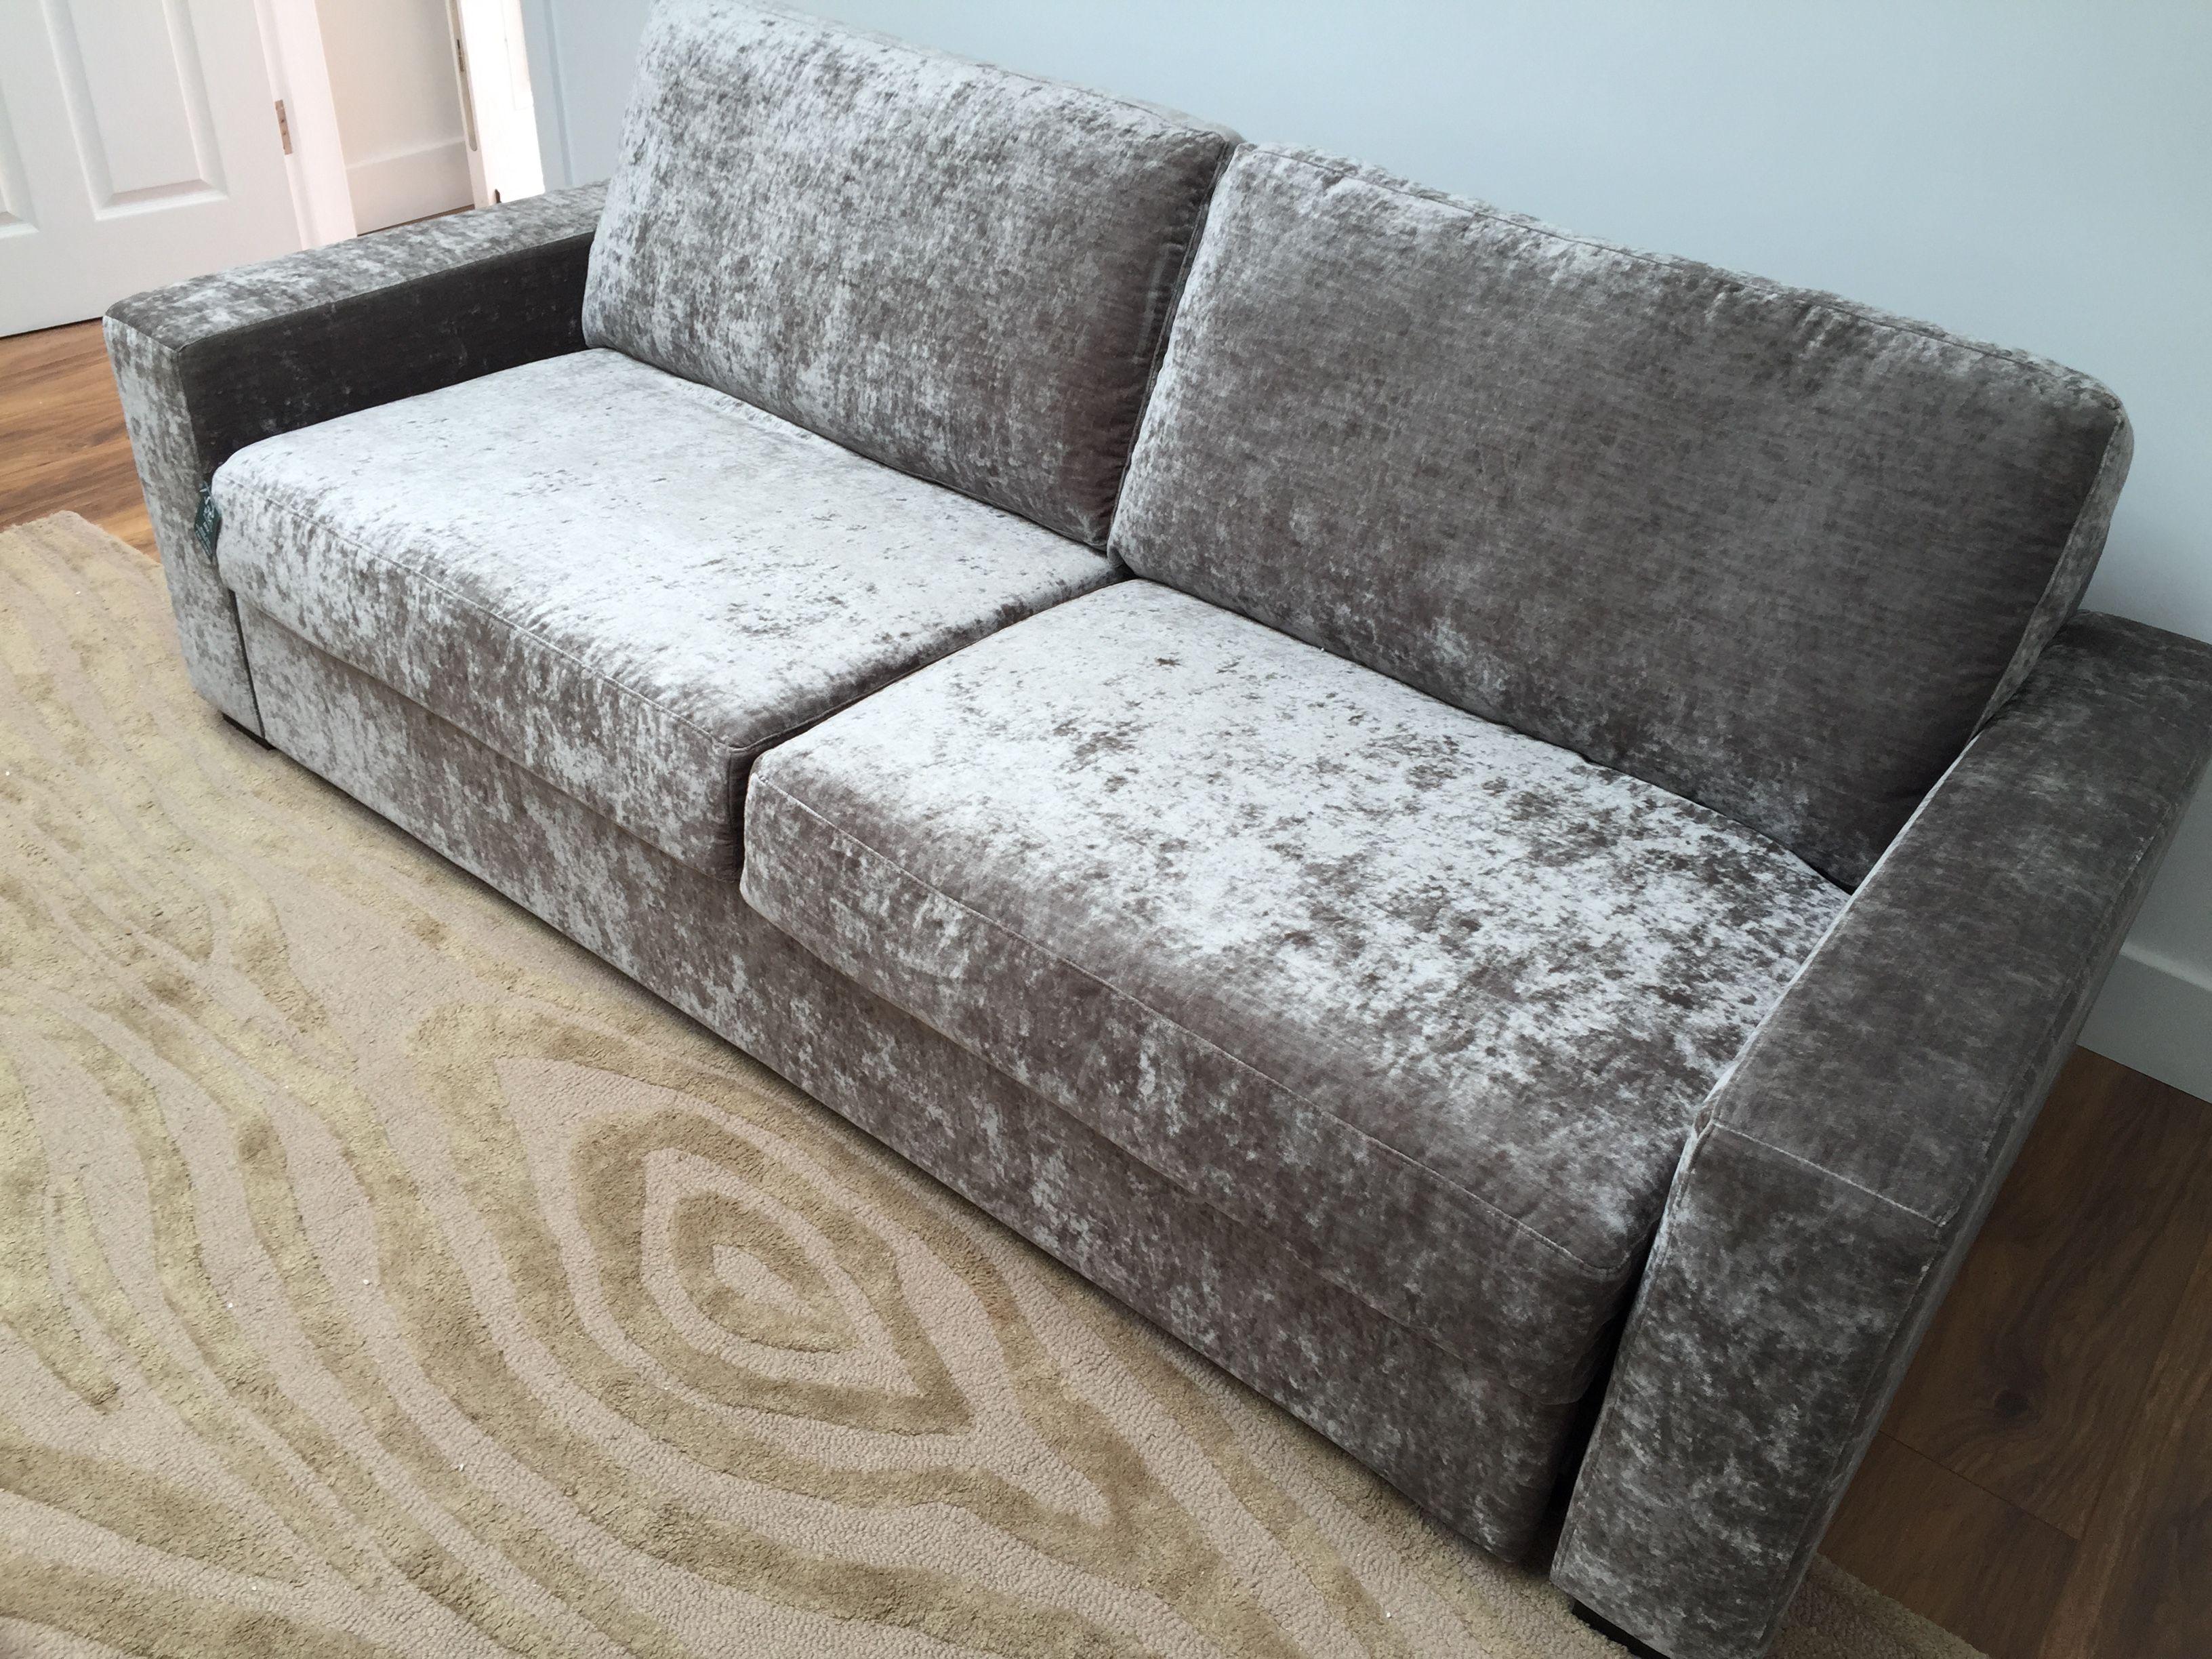 160 cm mattress / 216 cm wide sofa bed in Modena washable ...